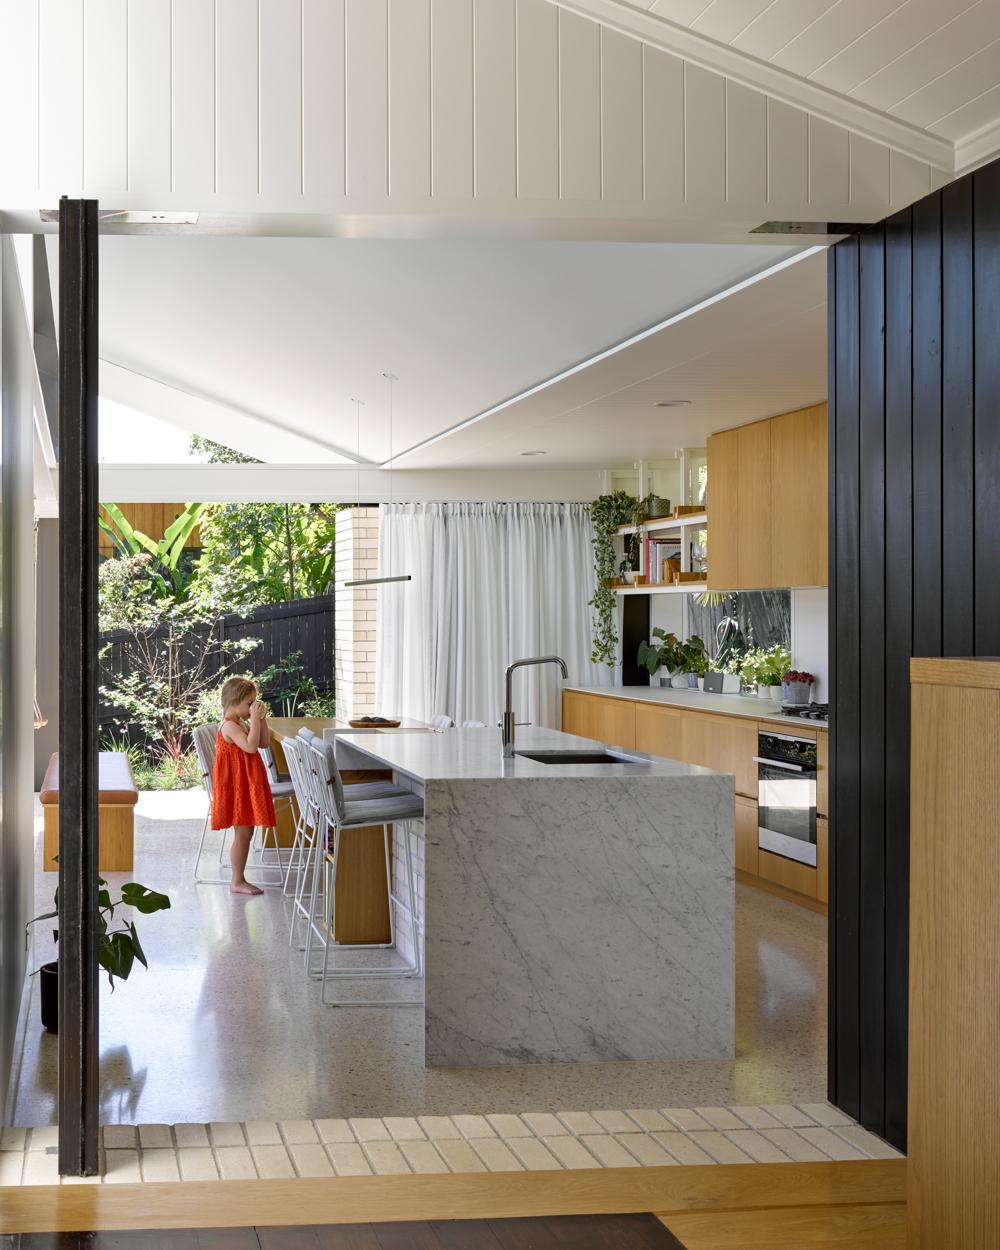 SP Studio - Jacaranda House-the-design-emotive-57158.jpg